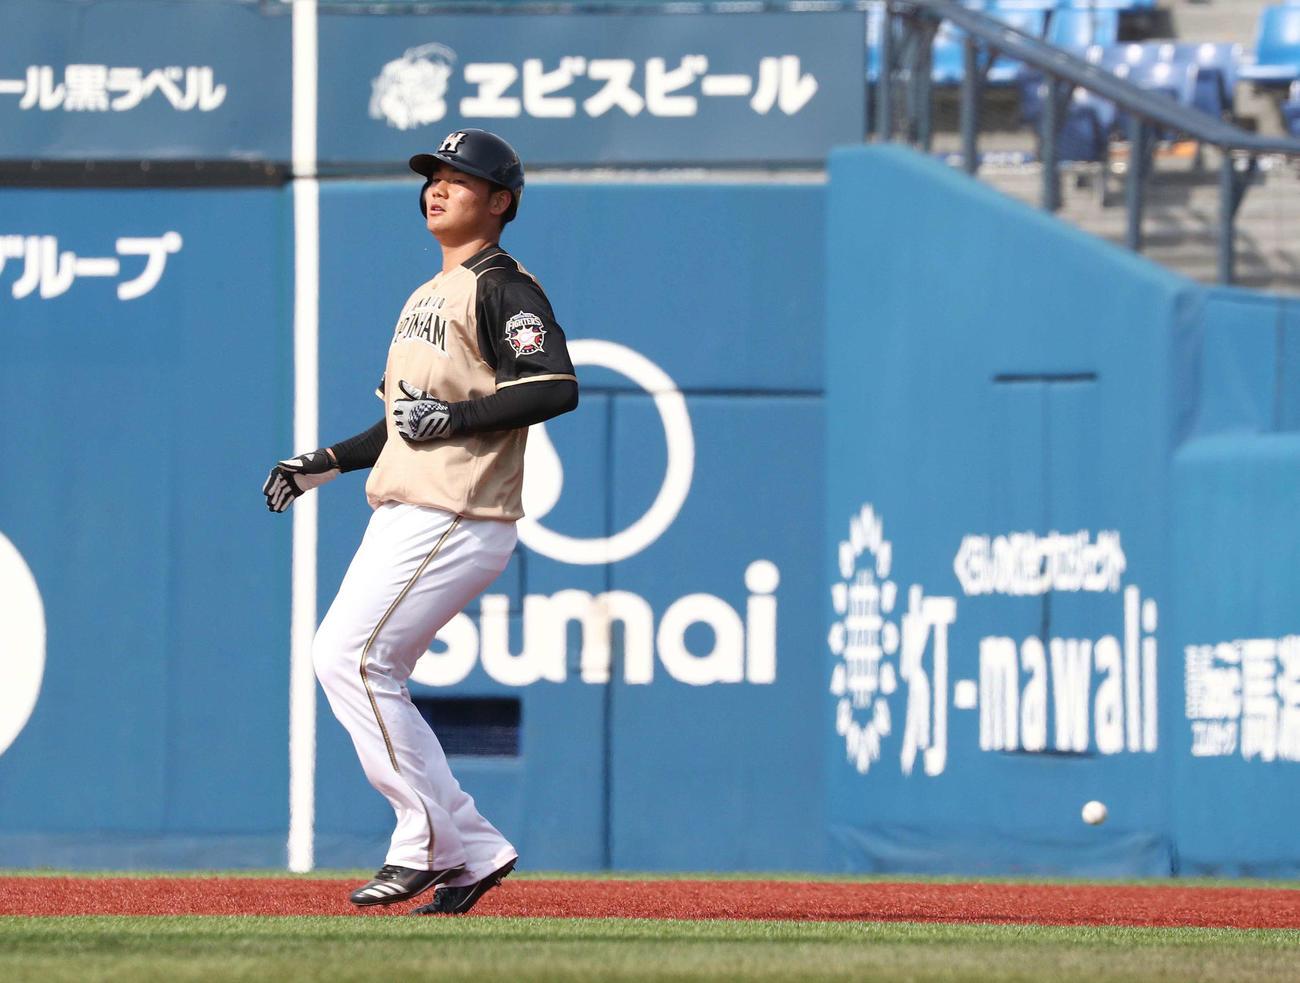 DeNA対日本ハム 8回表日本ハム2死一塁、谷口の打球が一塁走者の清宮に当たる(撮影・黒川智章)